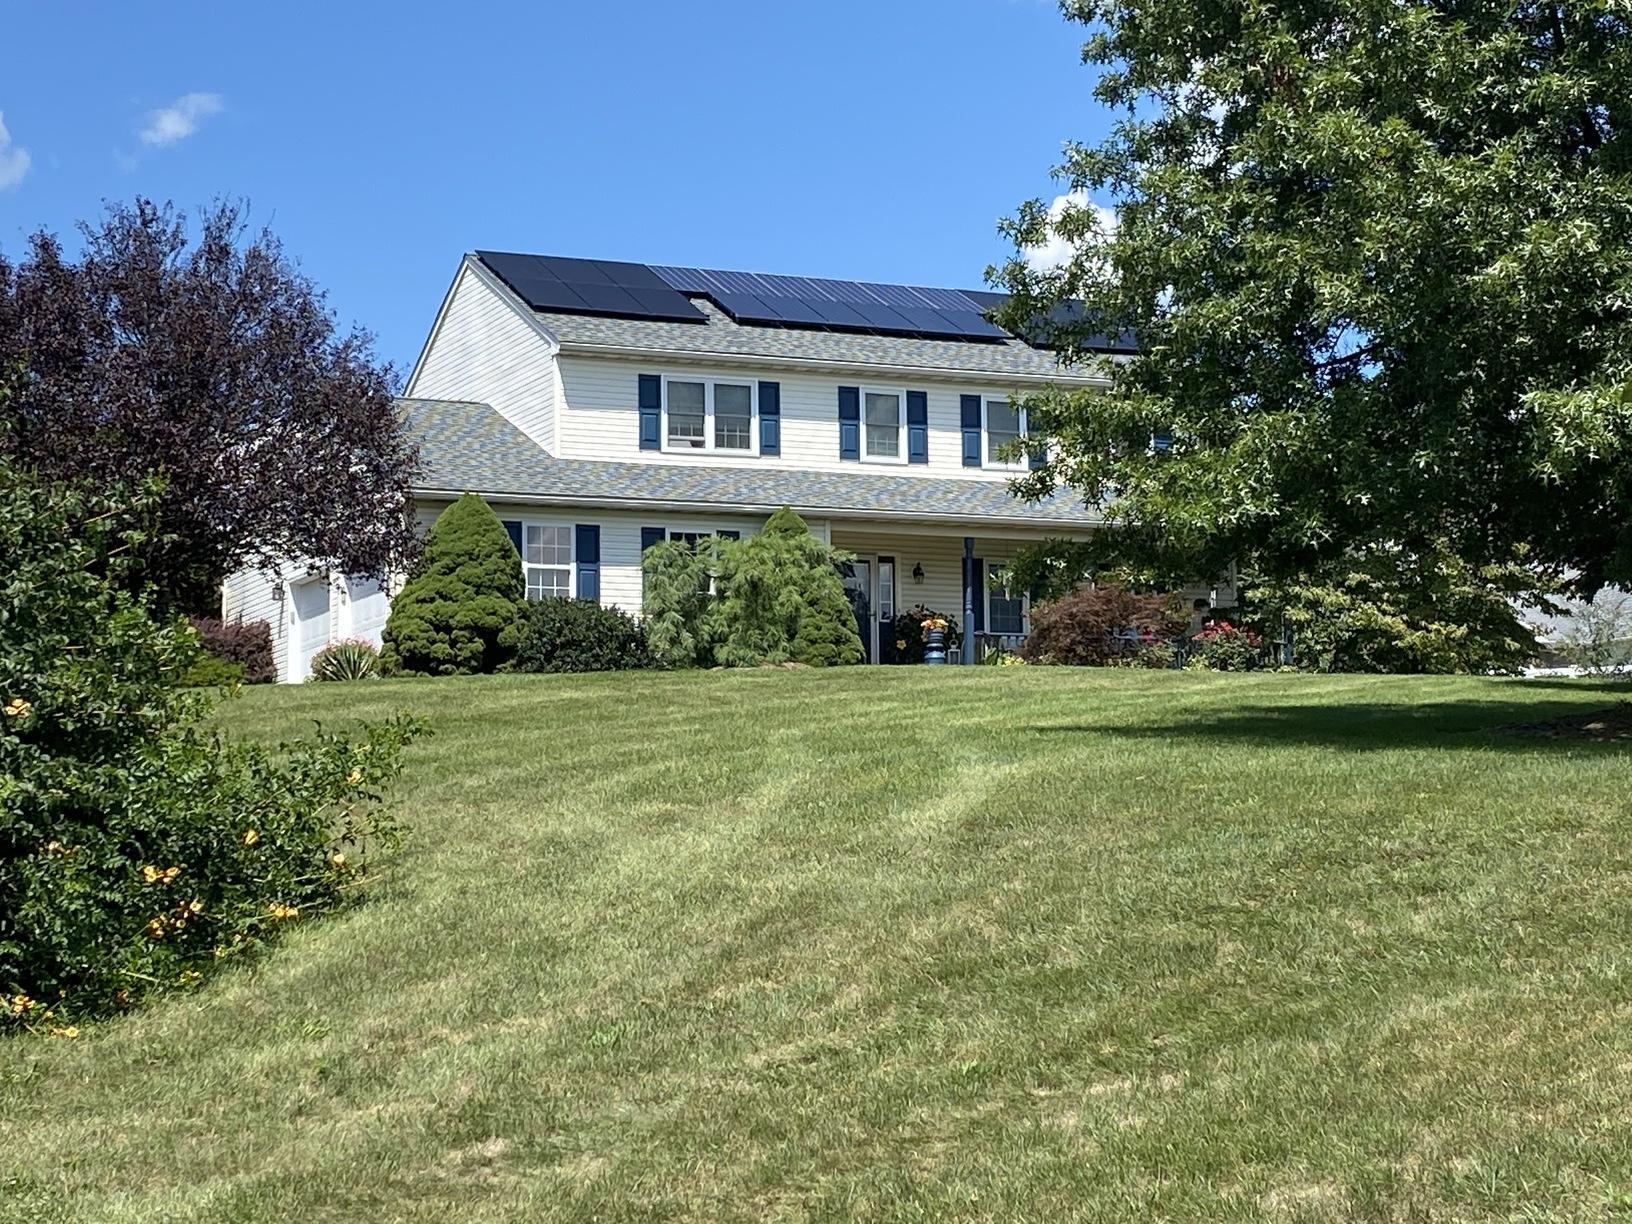 Brenda's solar installation done in Mohrsville, PA